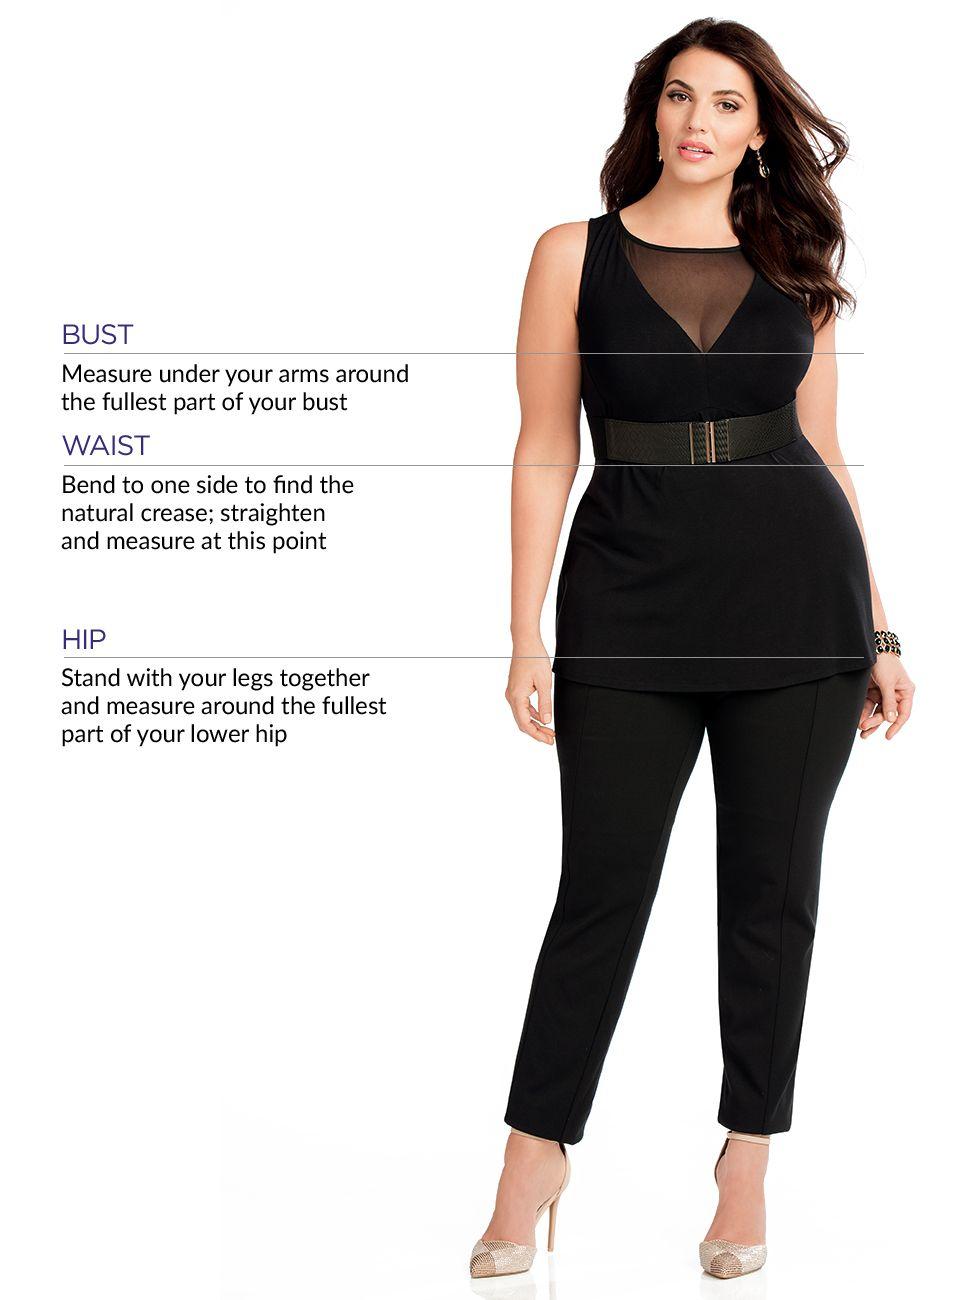 Plus Sizing Chart 0x-5x | Bras, Panties, Dresses | Catherines